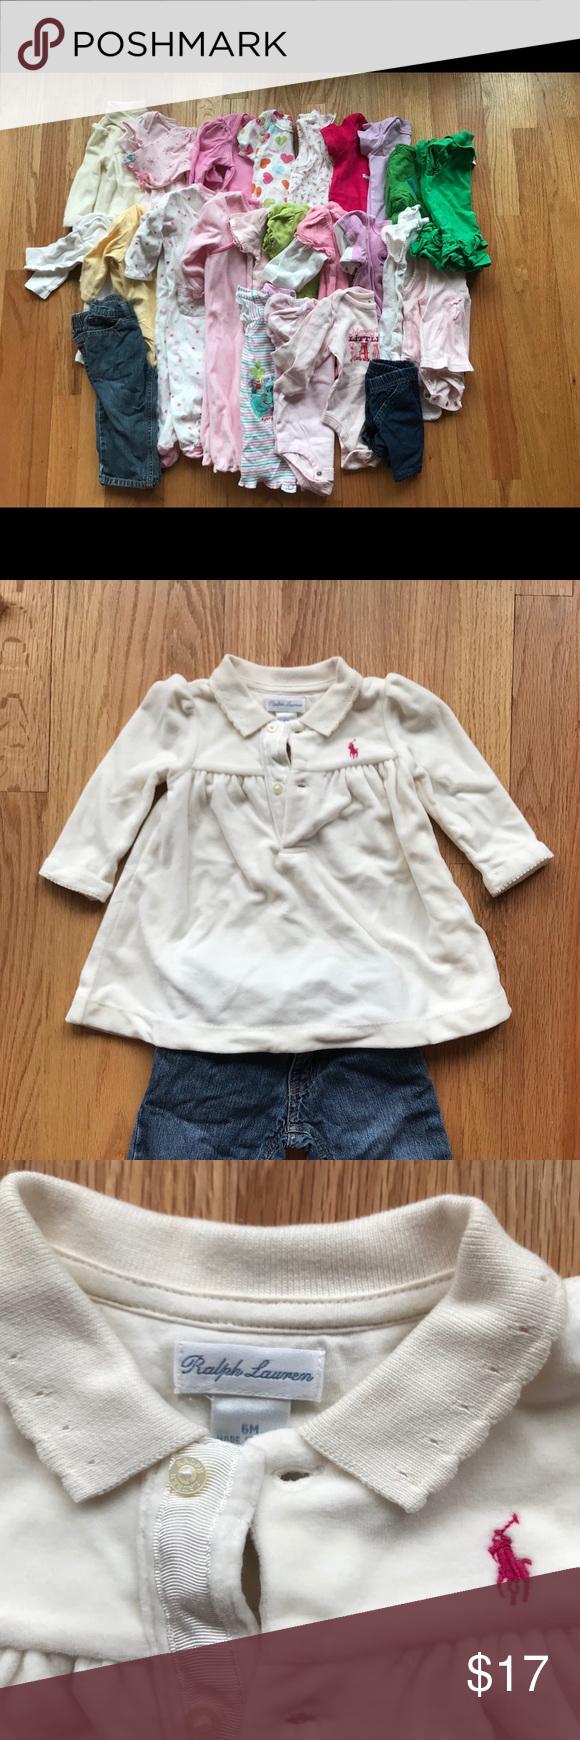 7b20ccd0 Ralph Lauren , Gap , Carter's Baby girls clothes 25 pieces of baby ...